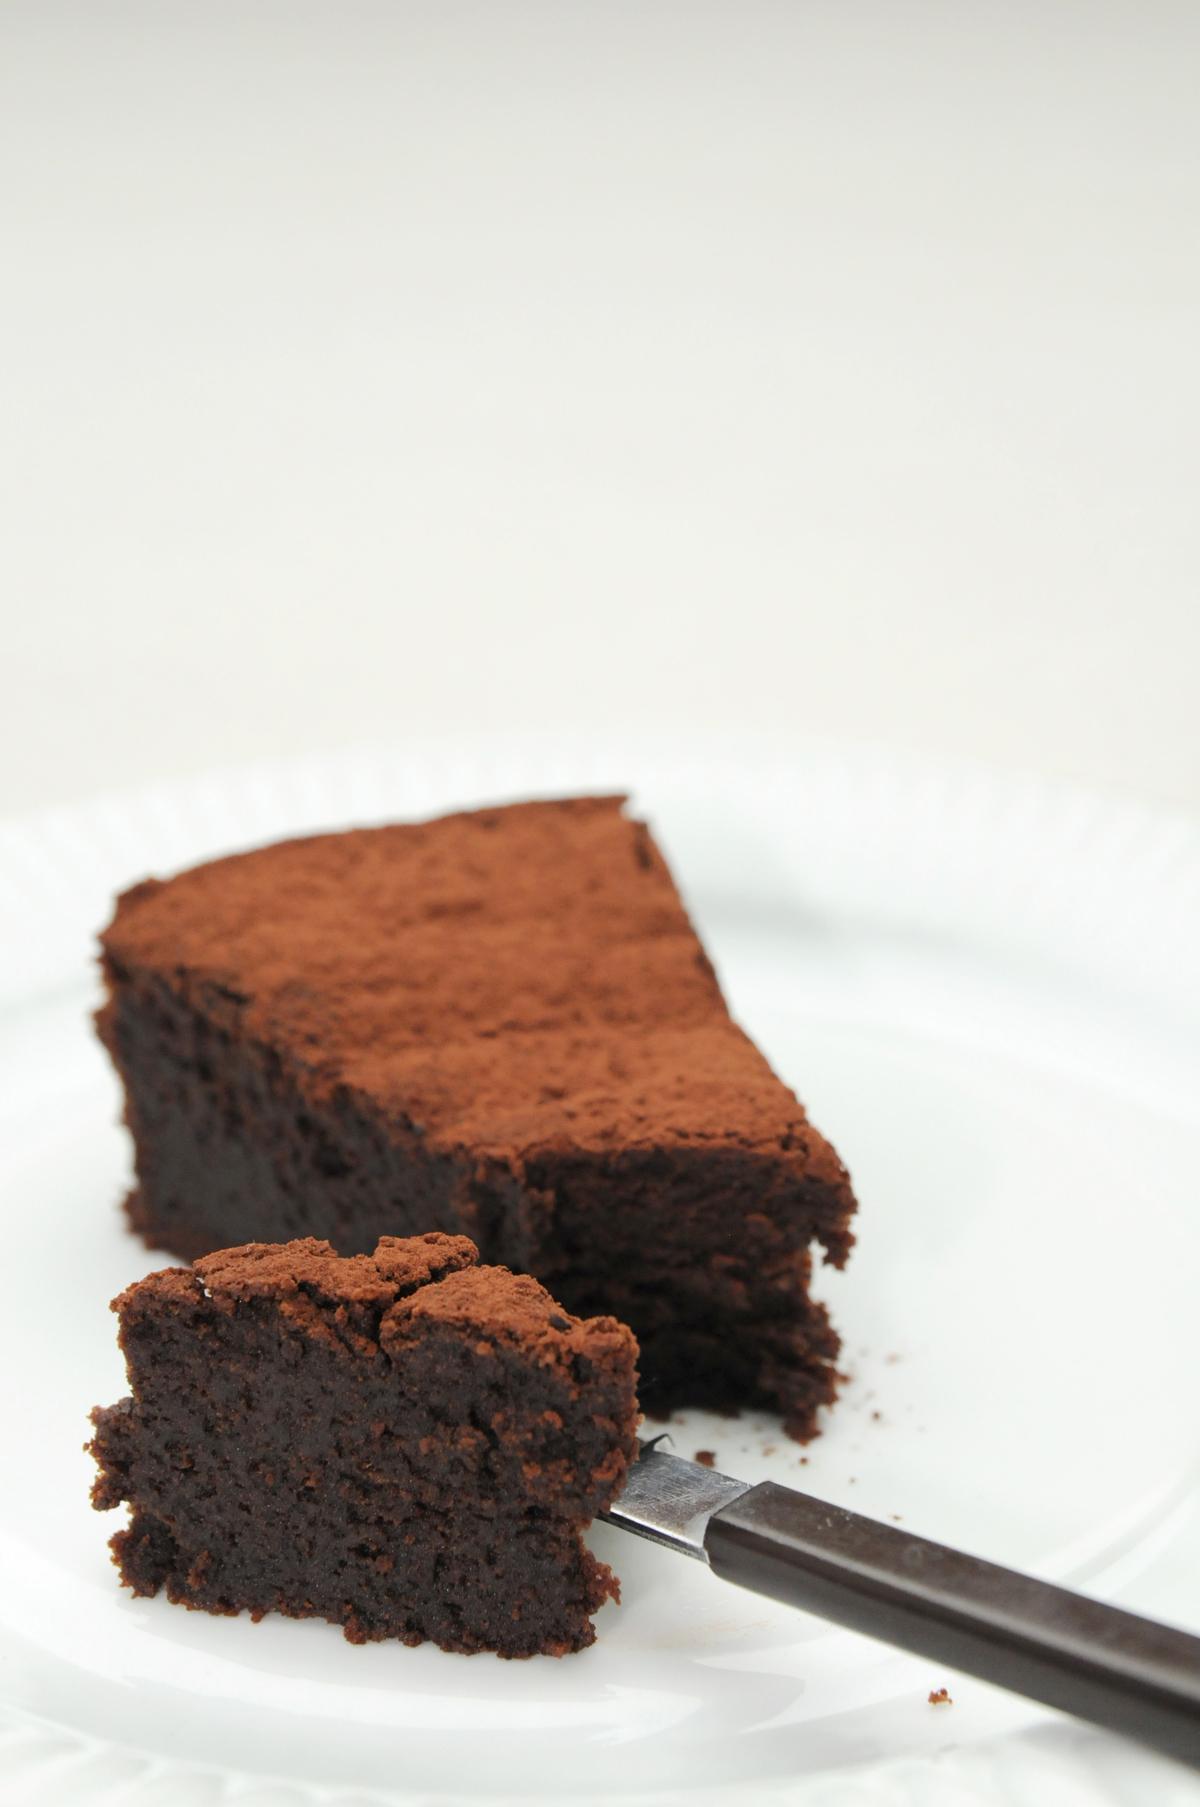 Chocolate Cake For Cm Tin